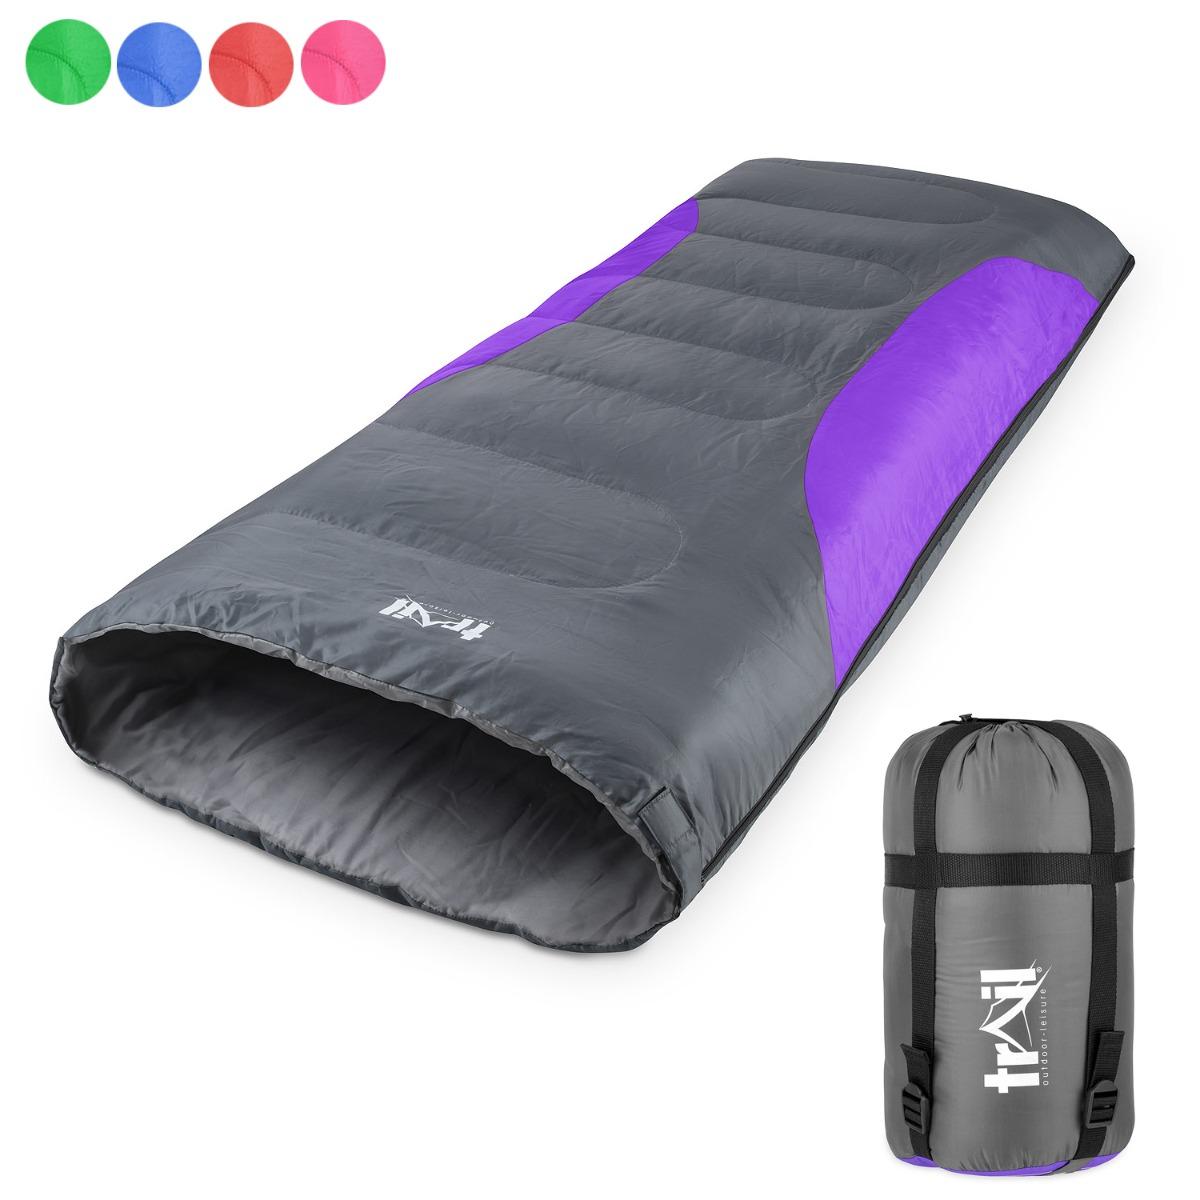 Mummy Sleeping Bag - Purple